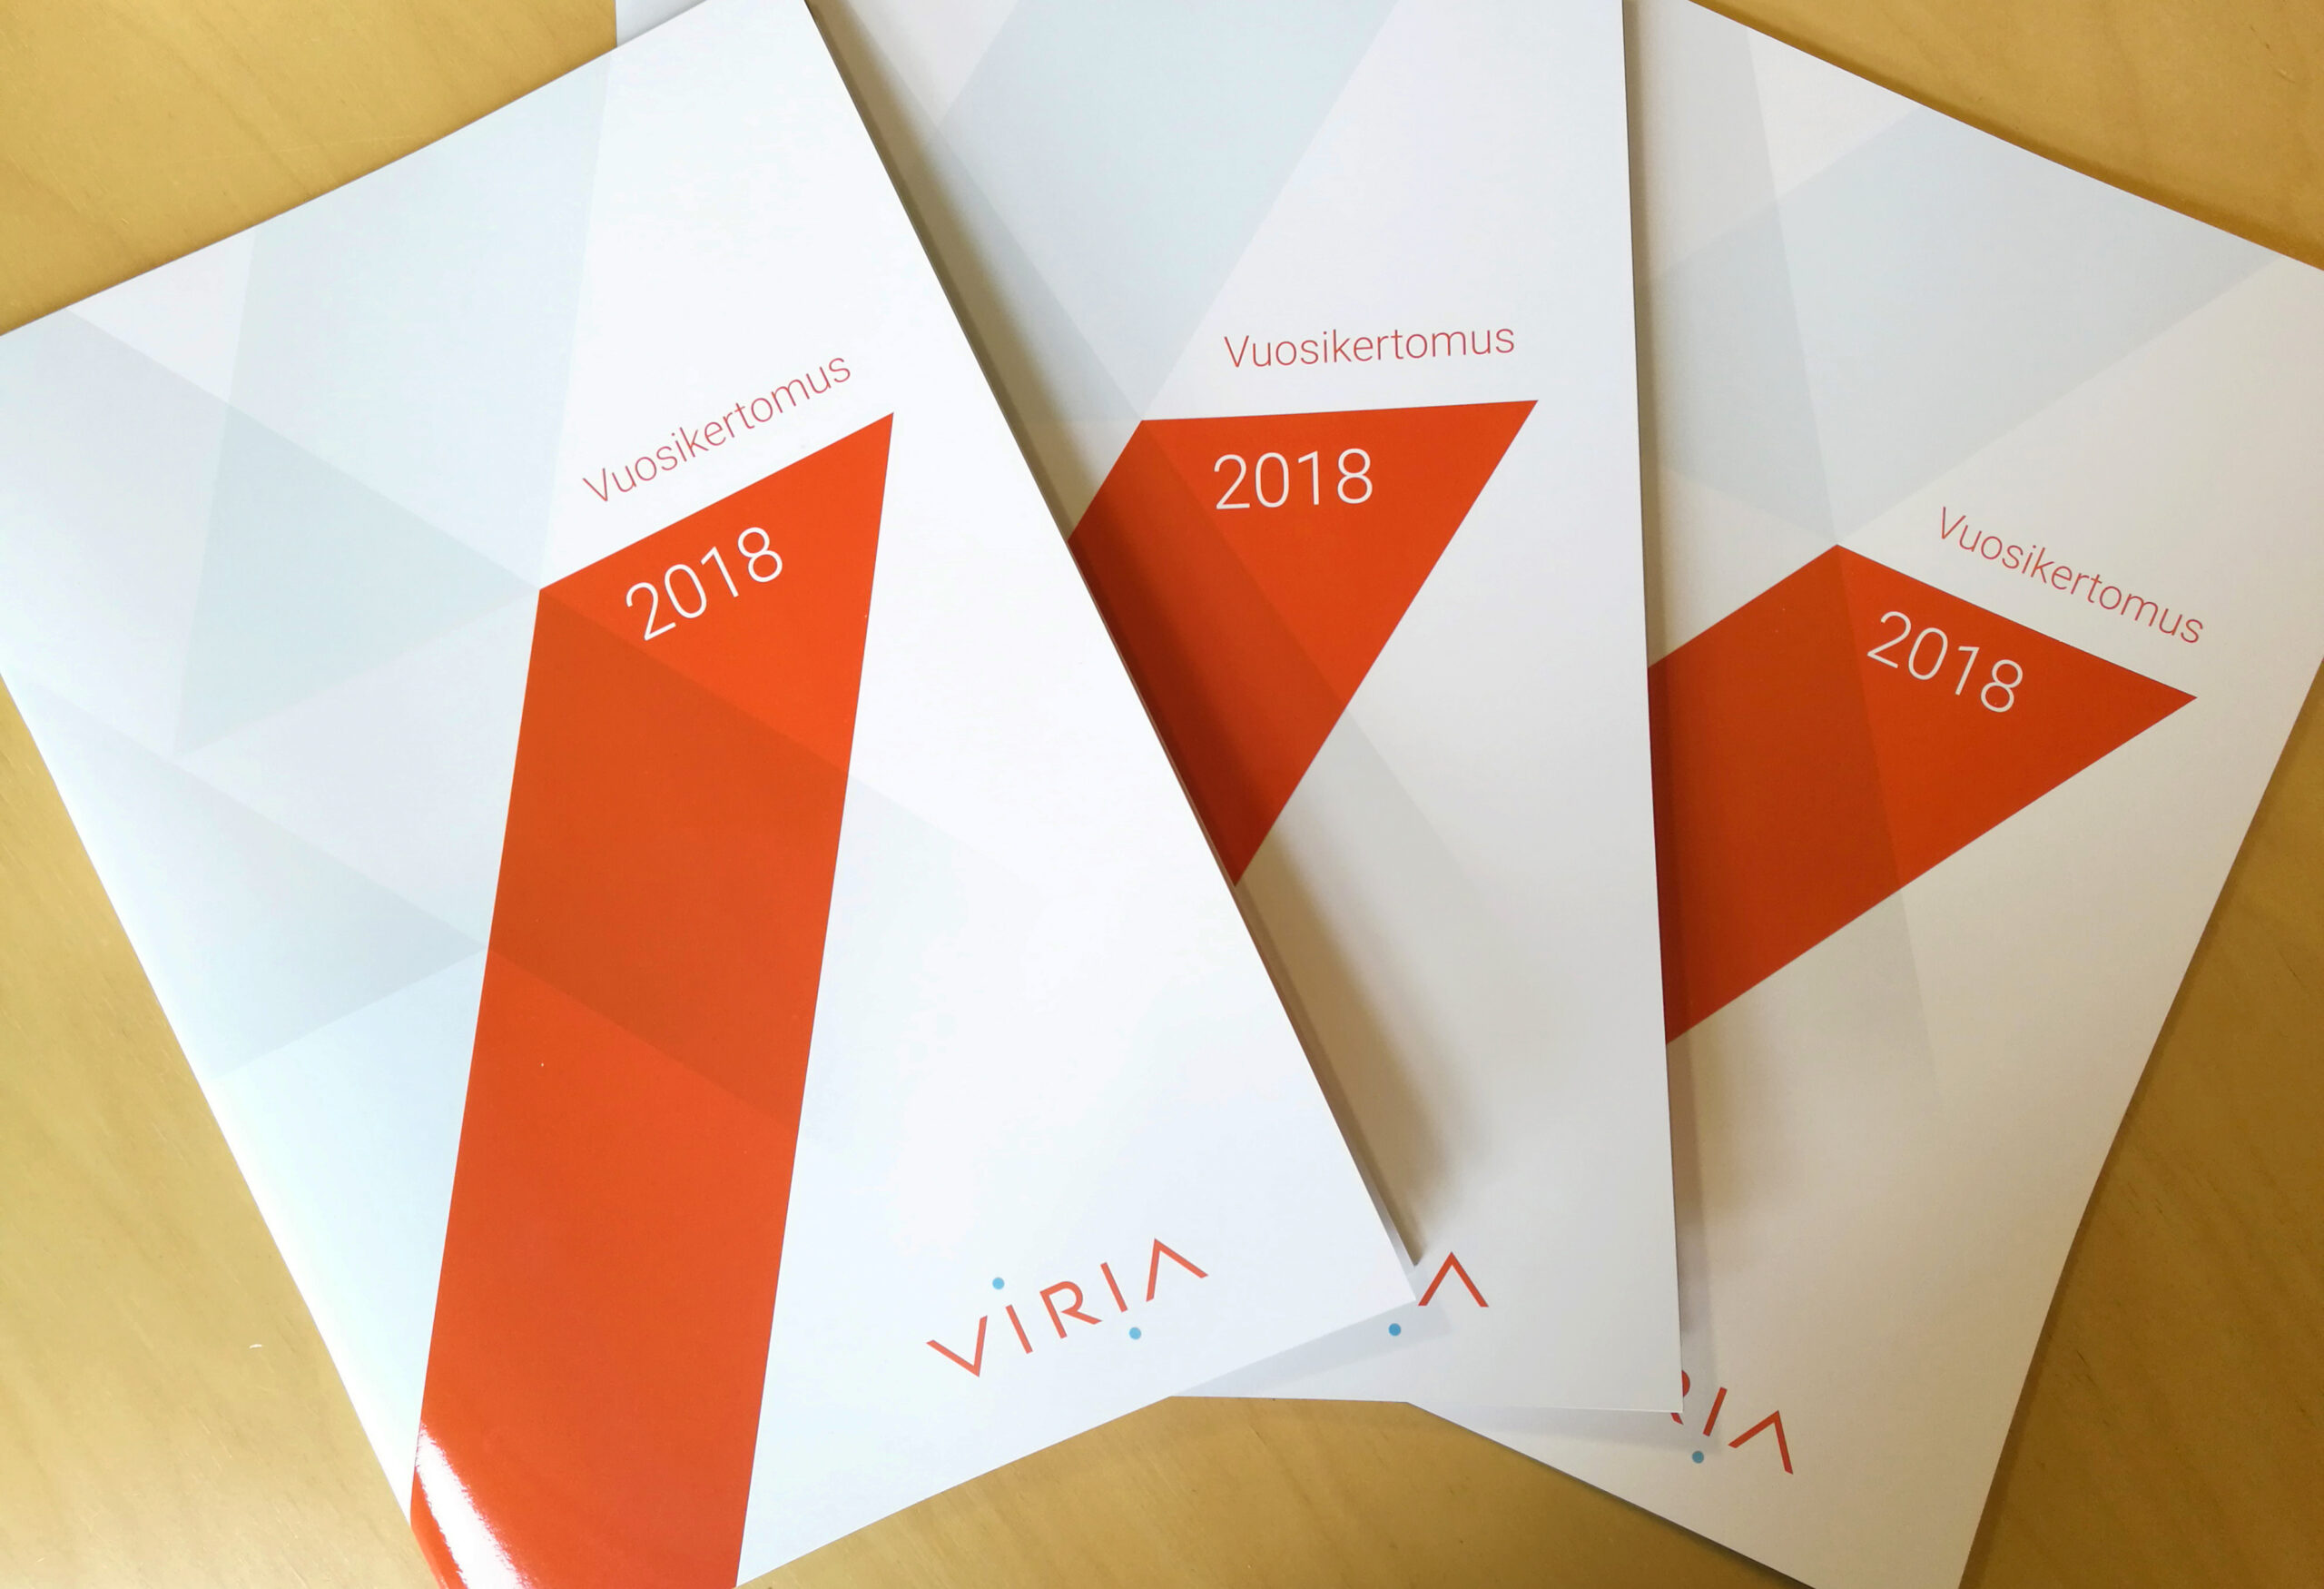 Virias årsberättelse har utkommit